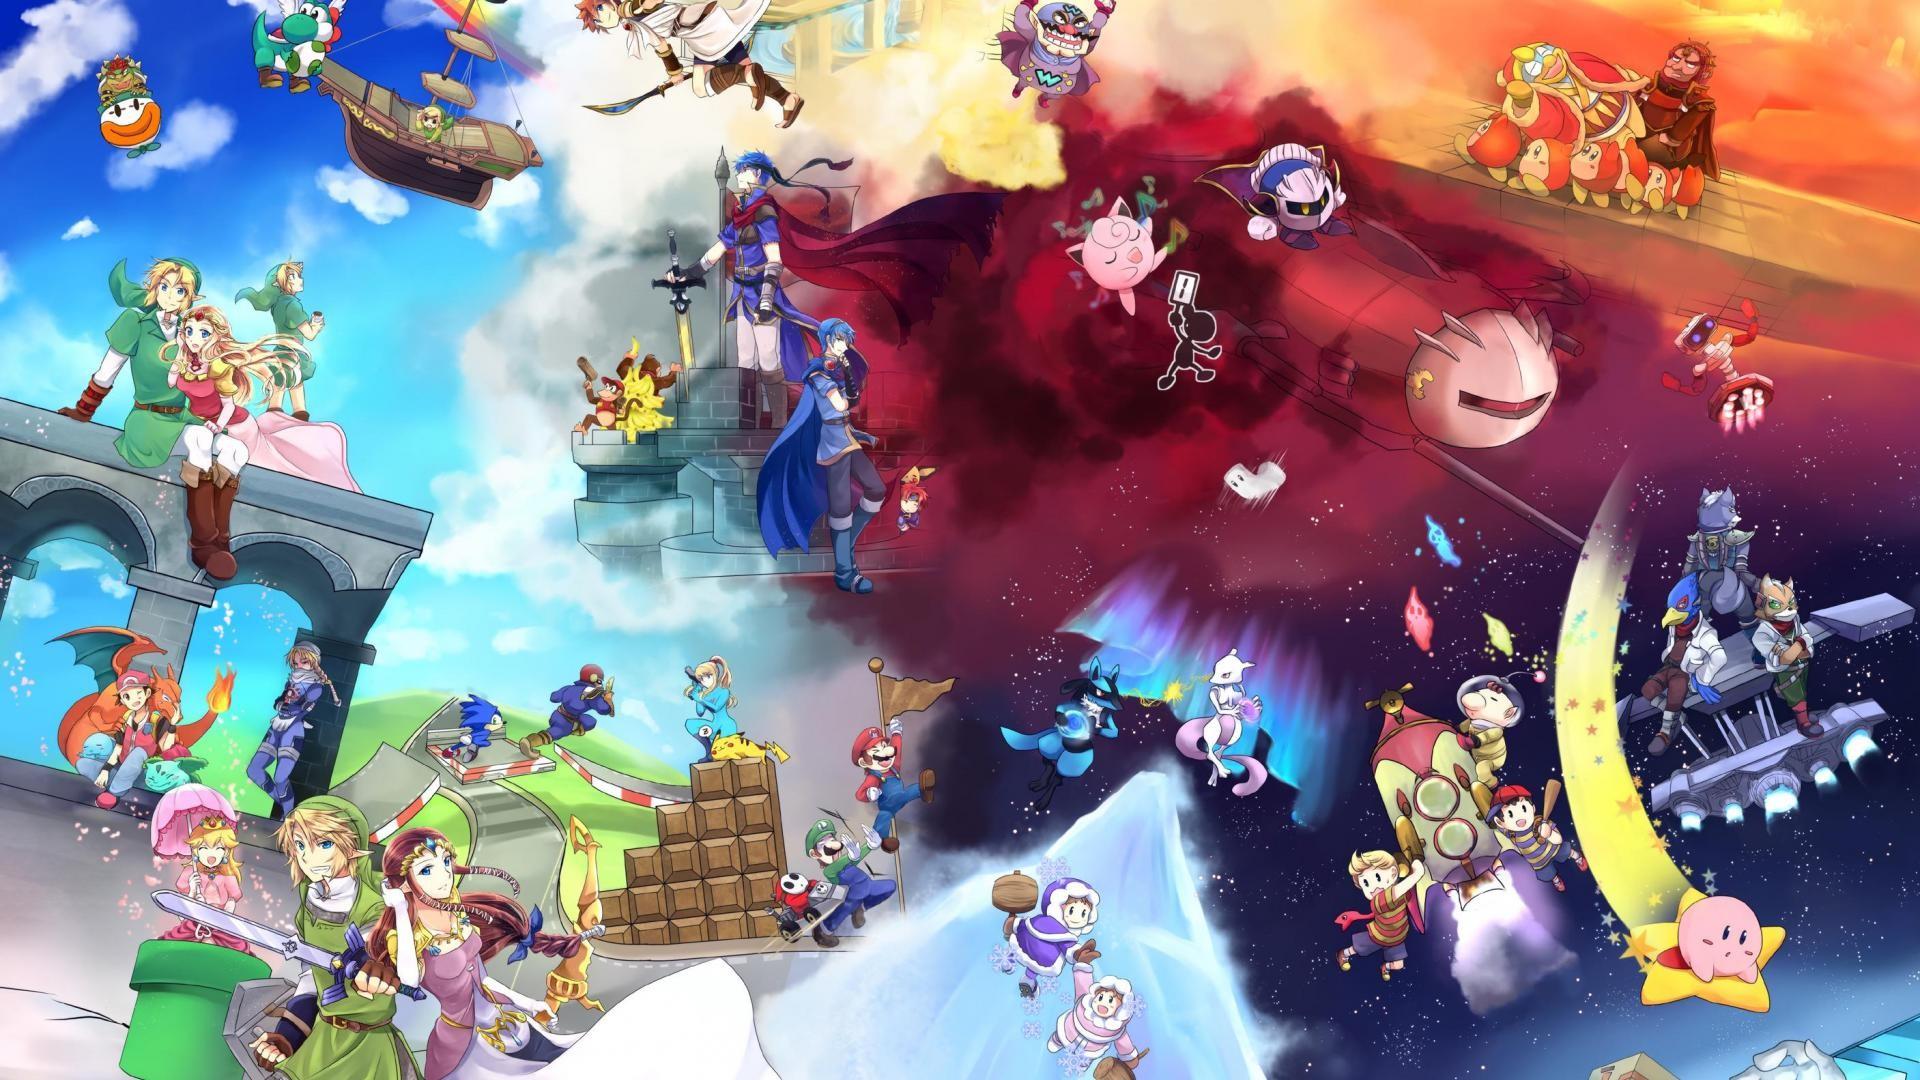 Nintendo wallpaper 77 images - Nes wallpaper ...